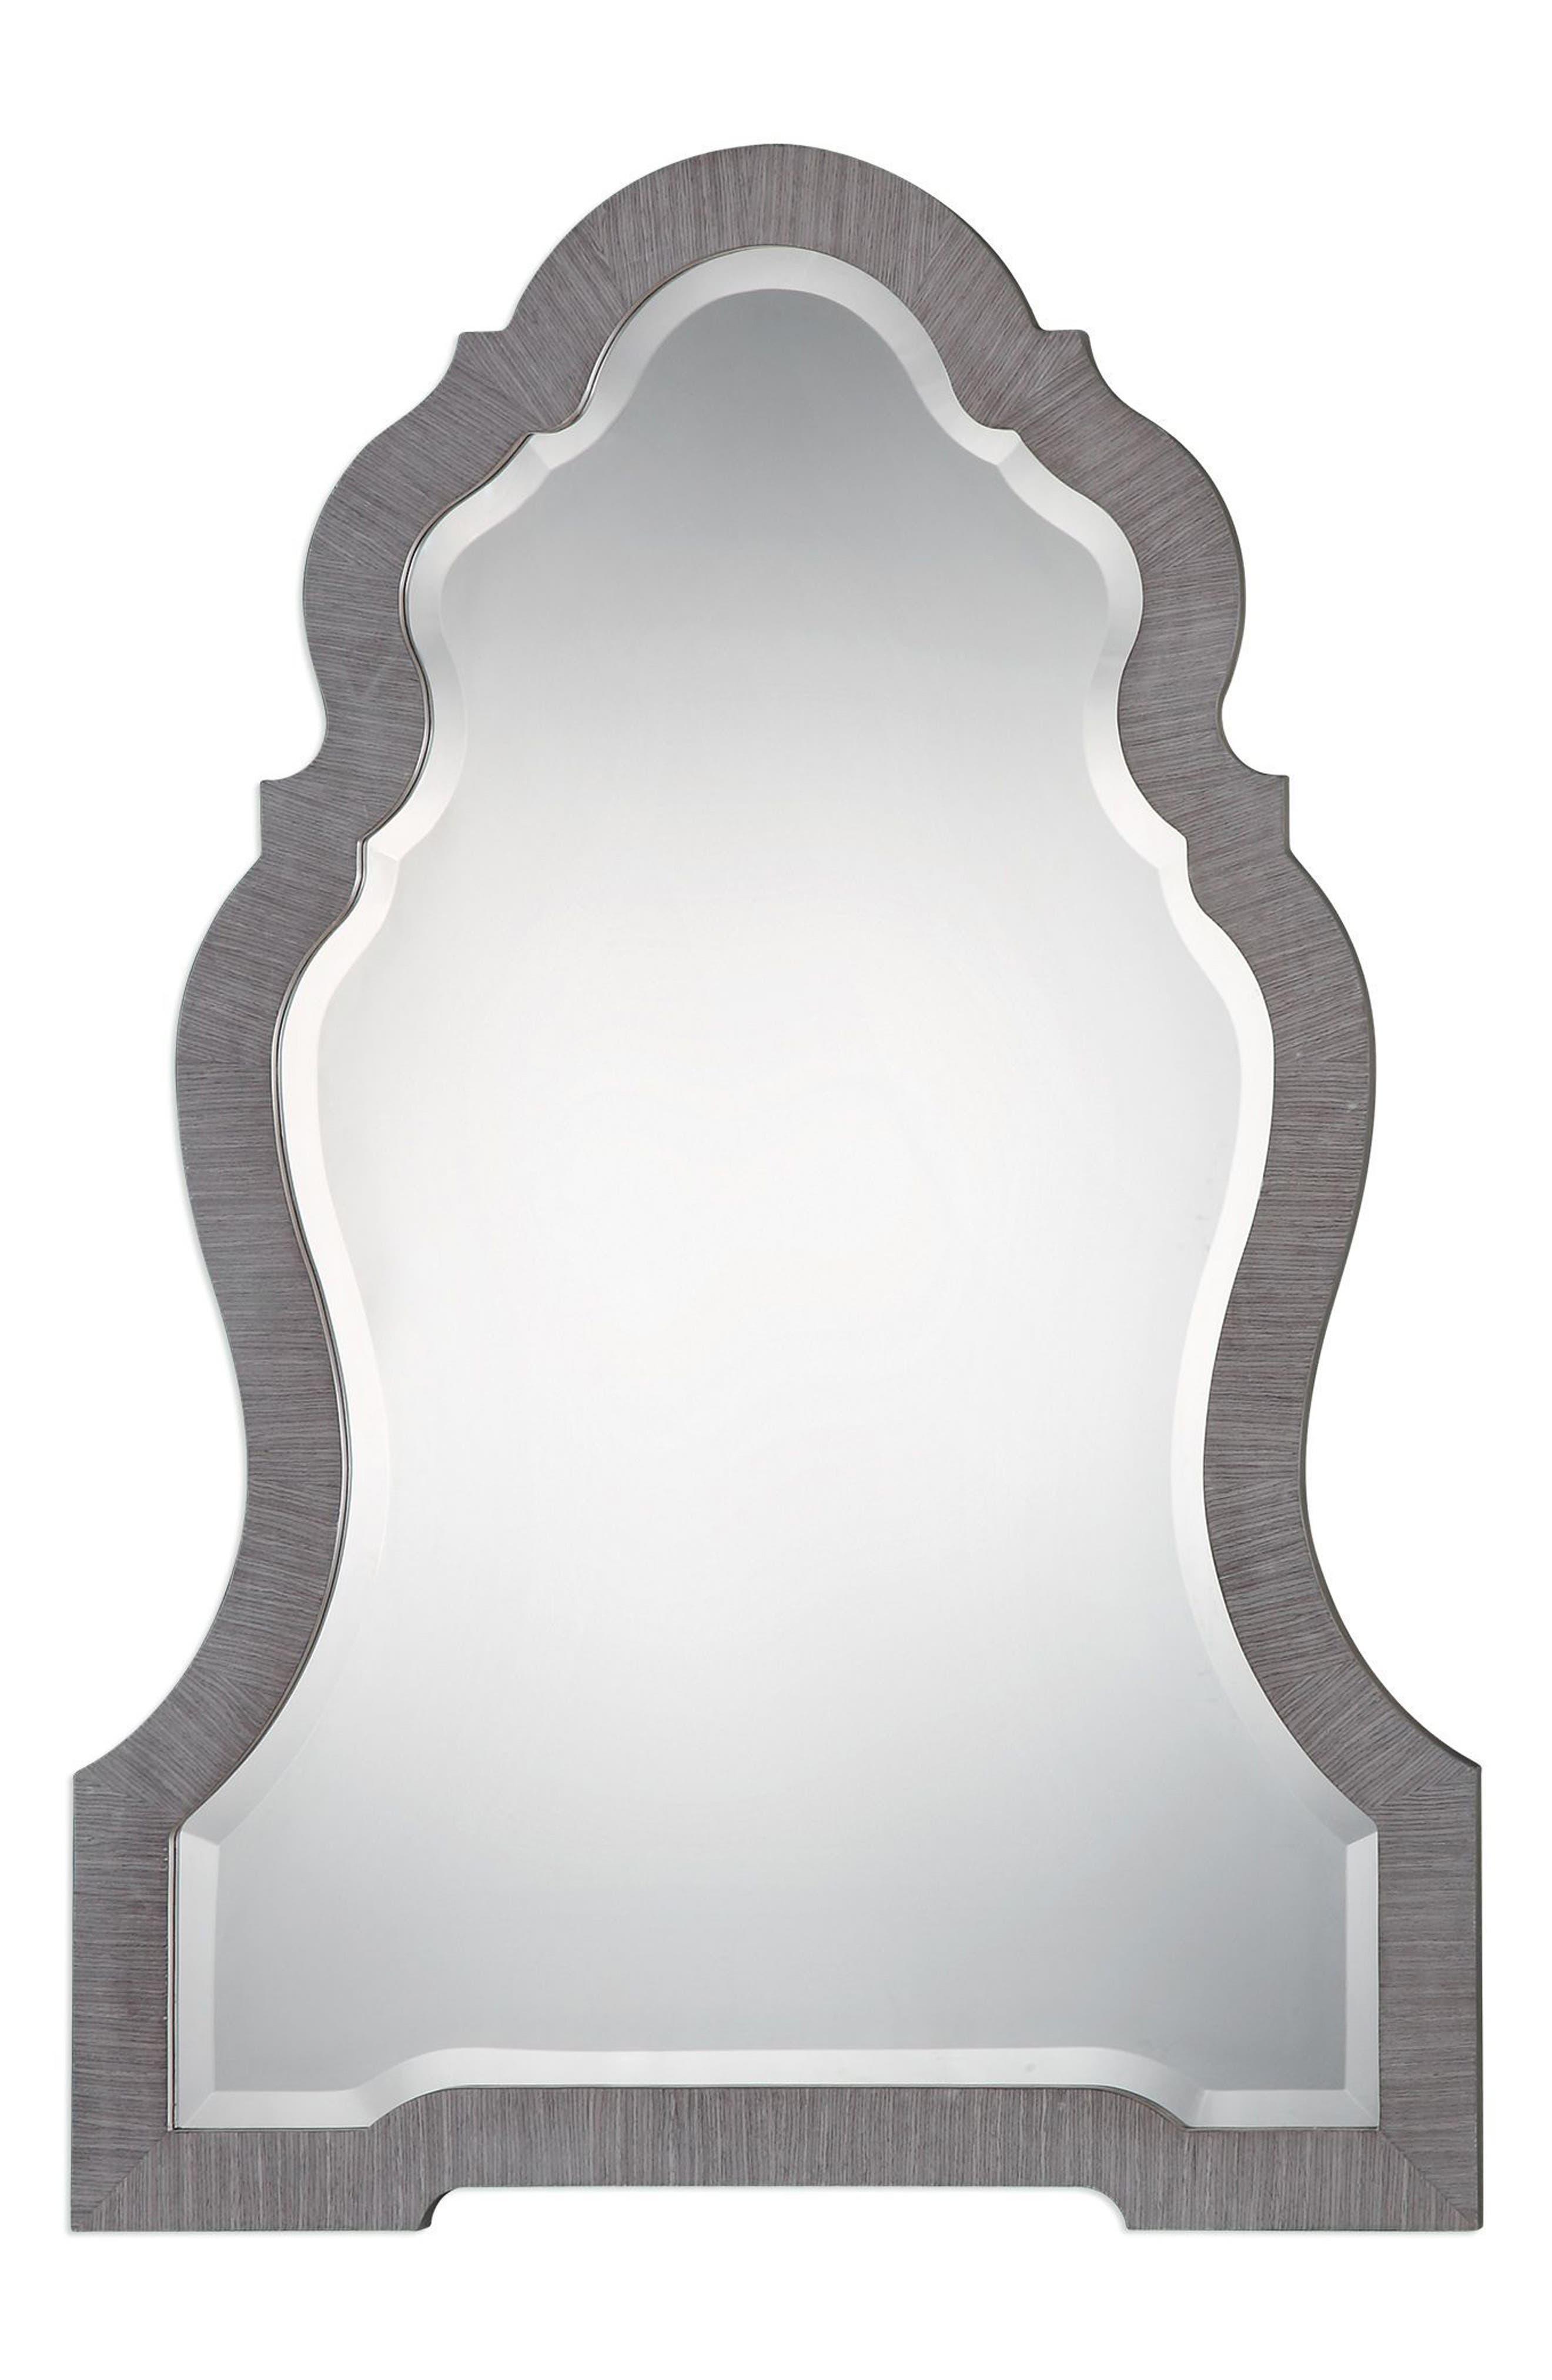 Carroll Wall Mirror,                         Main,                         color, Metallic Silver